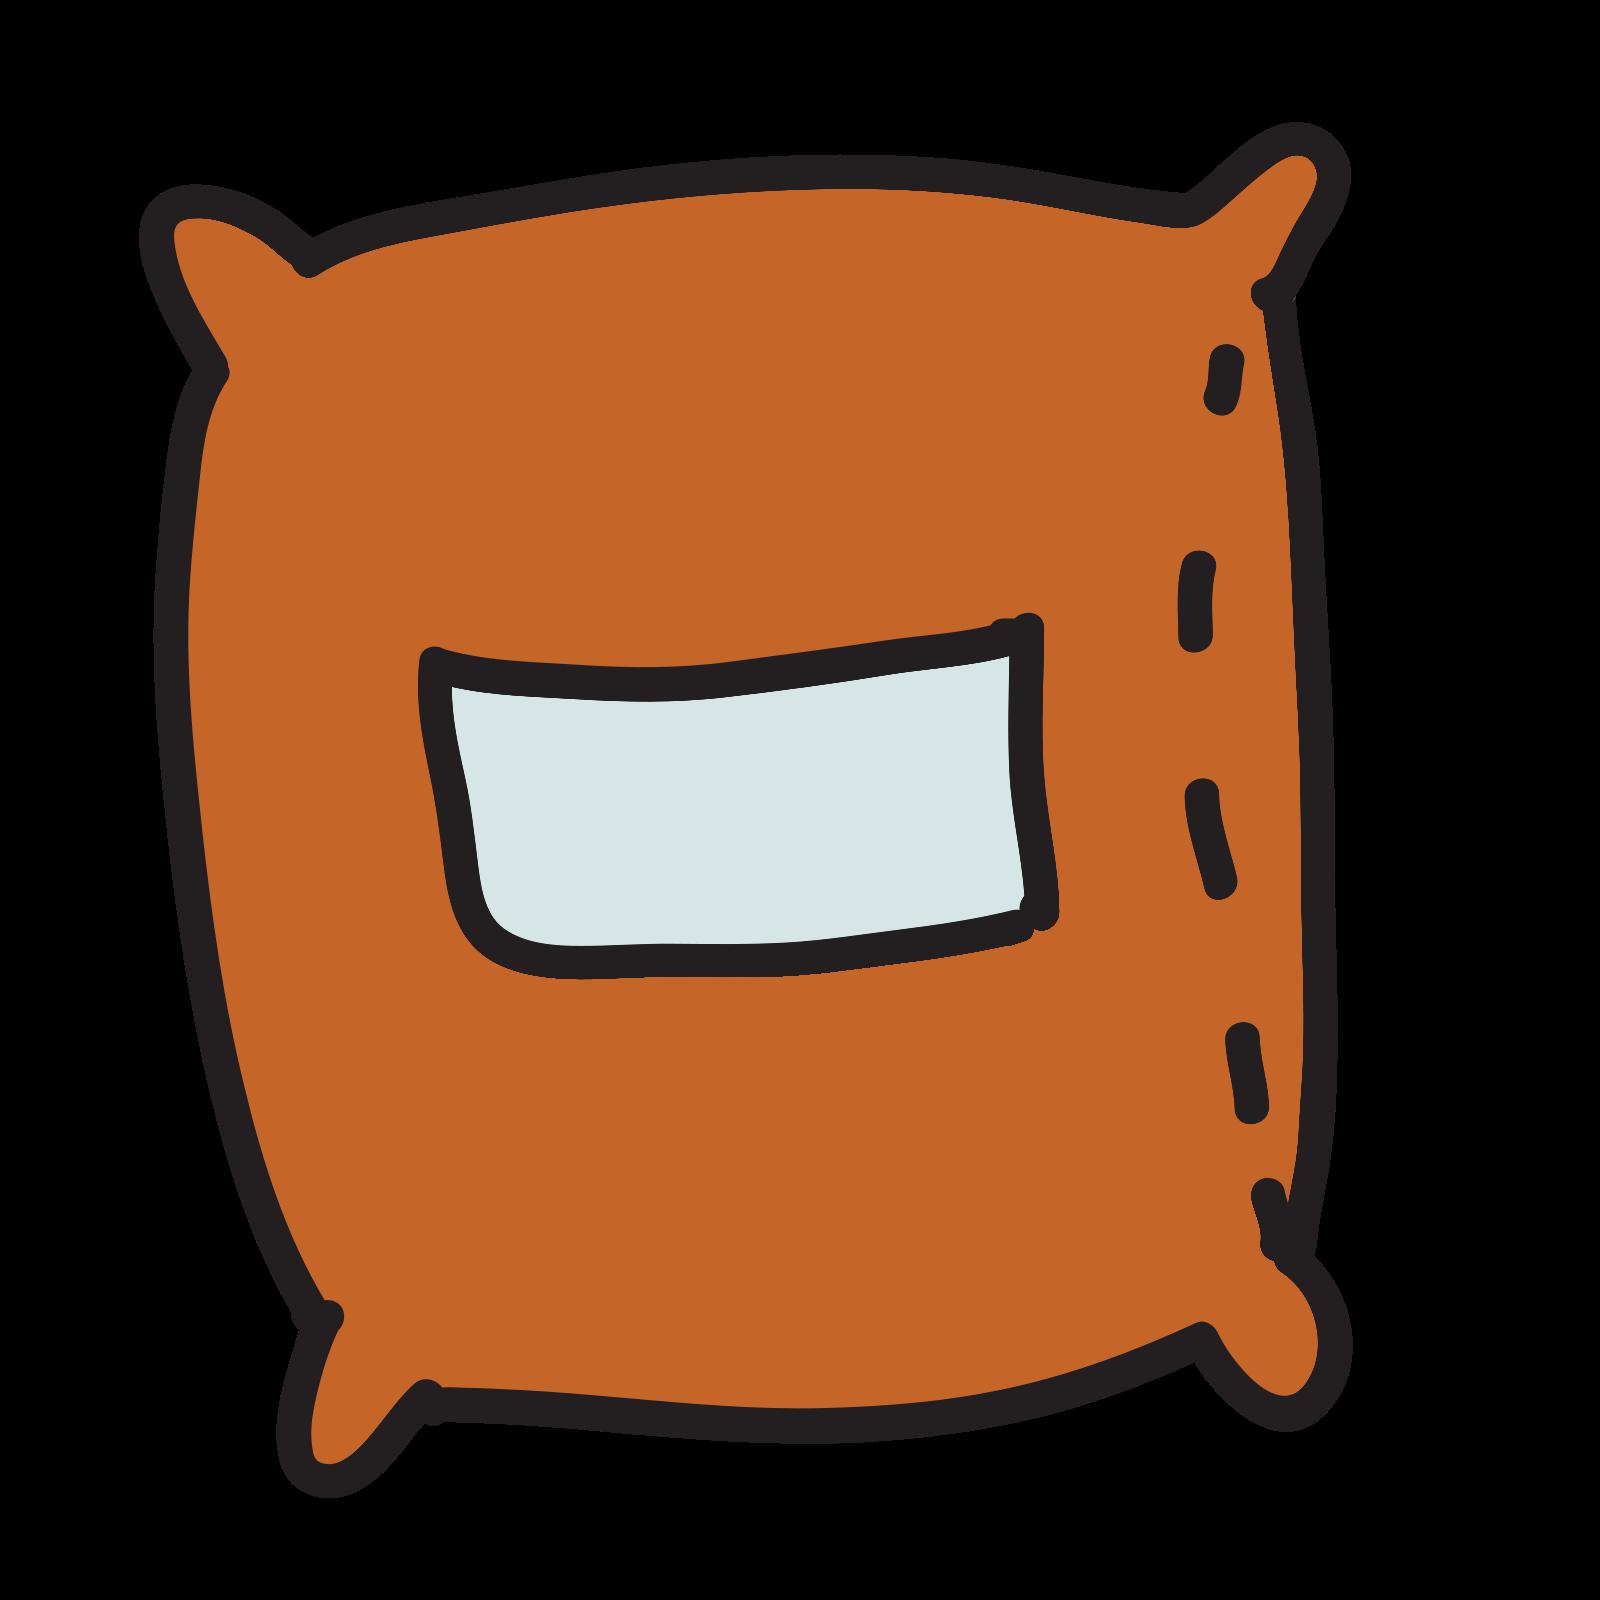 Sugar Sack icon